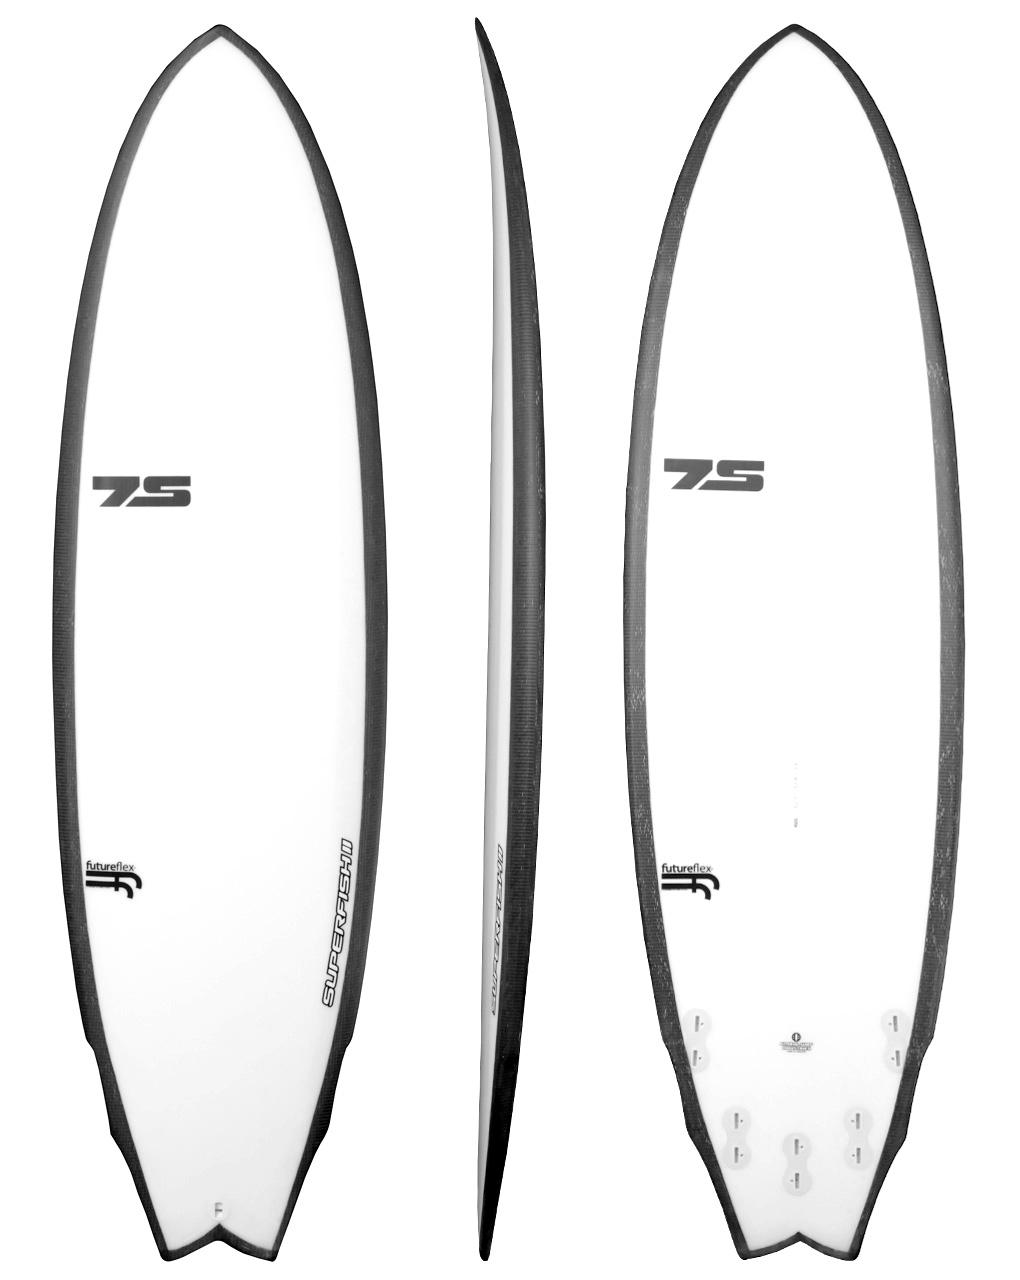 1020x1280 Surfboard Outline Clip Art Clipart